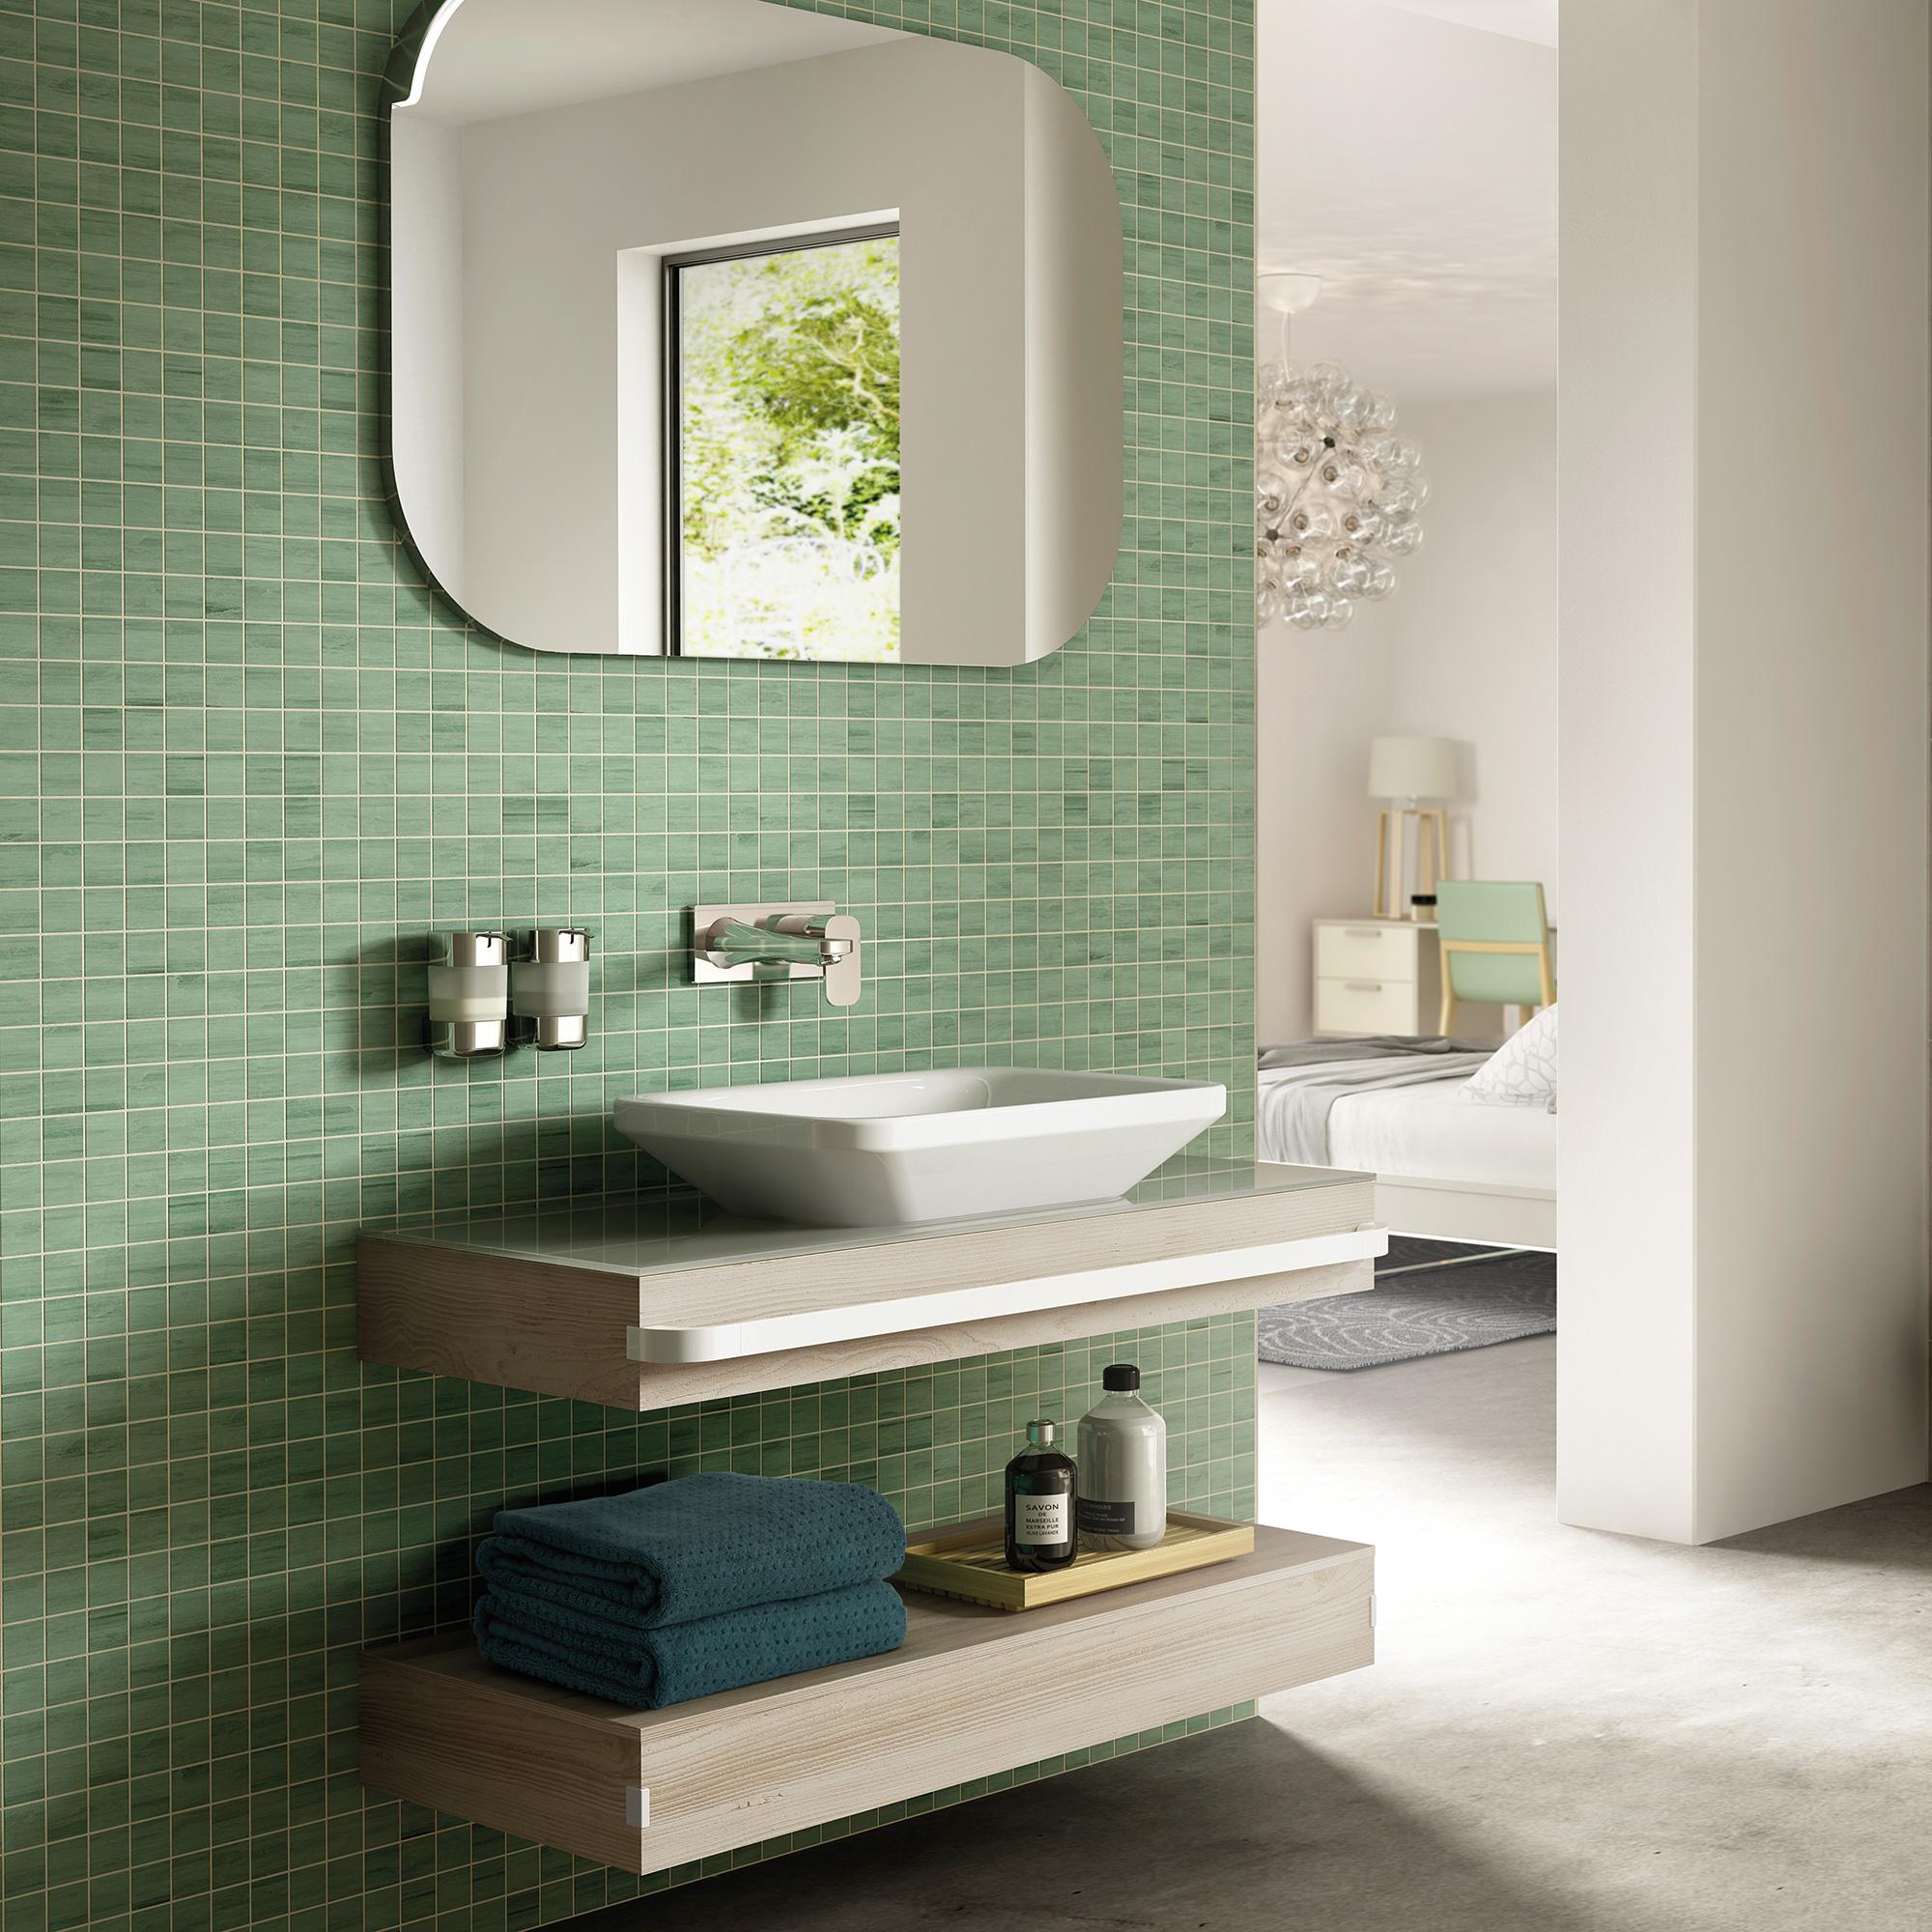 ideal standard tonic ii schale symmetrisch 55 cm wei. Black Bedroom Furniture Sets. Home Design Ideas